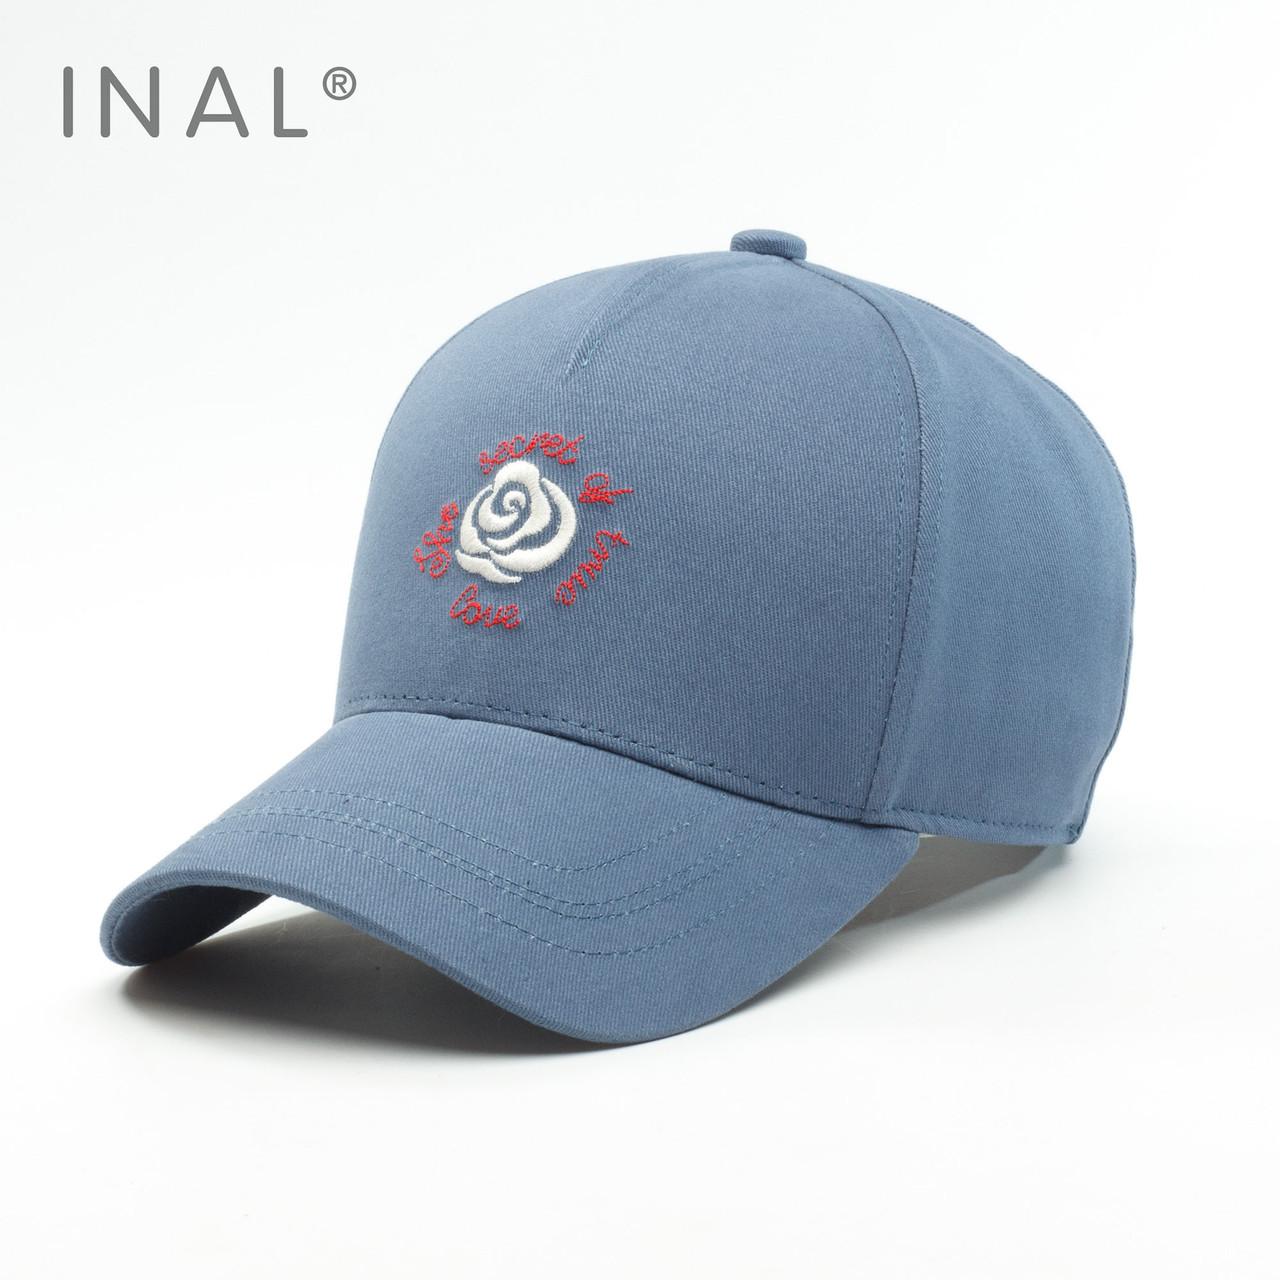 Кепка бейсболка, Rose, Хлопок, Синий, Inal